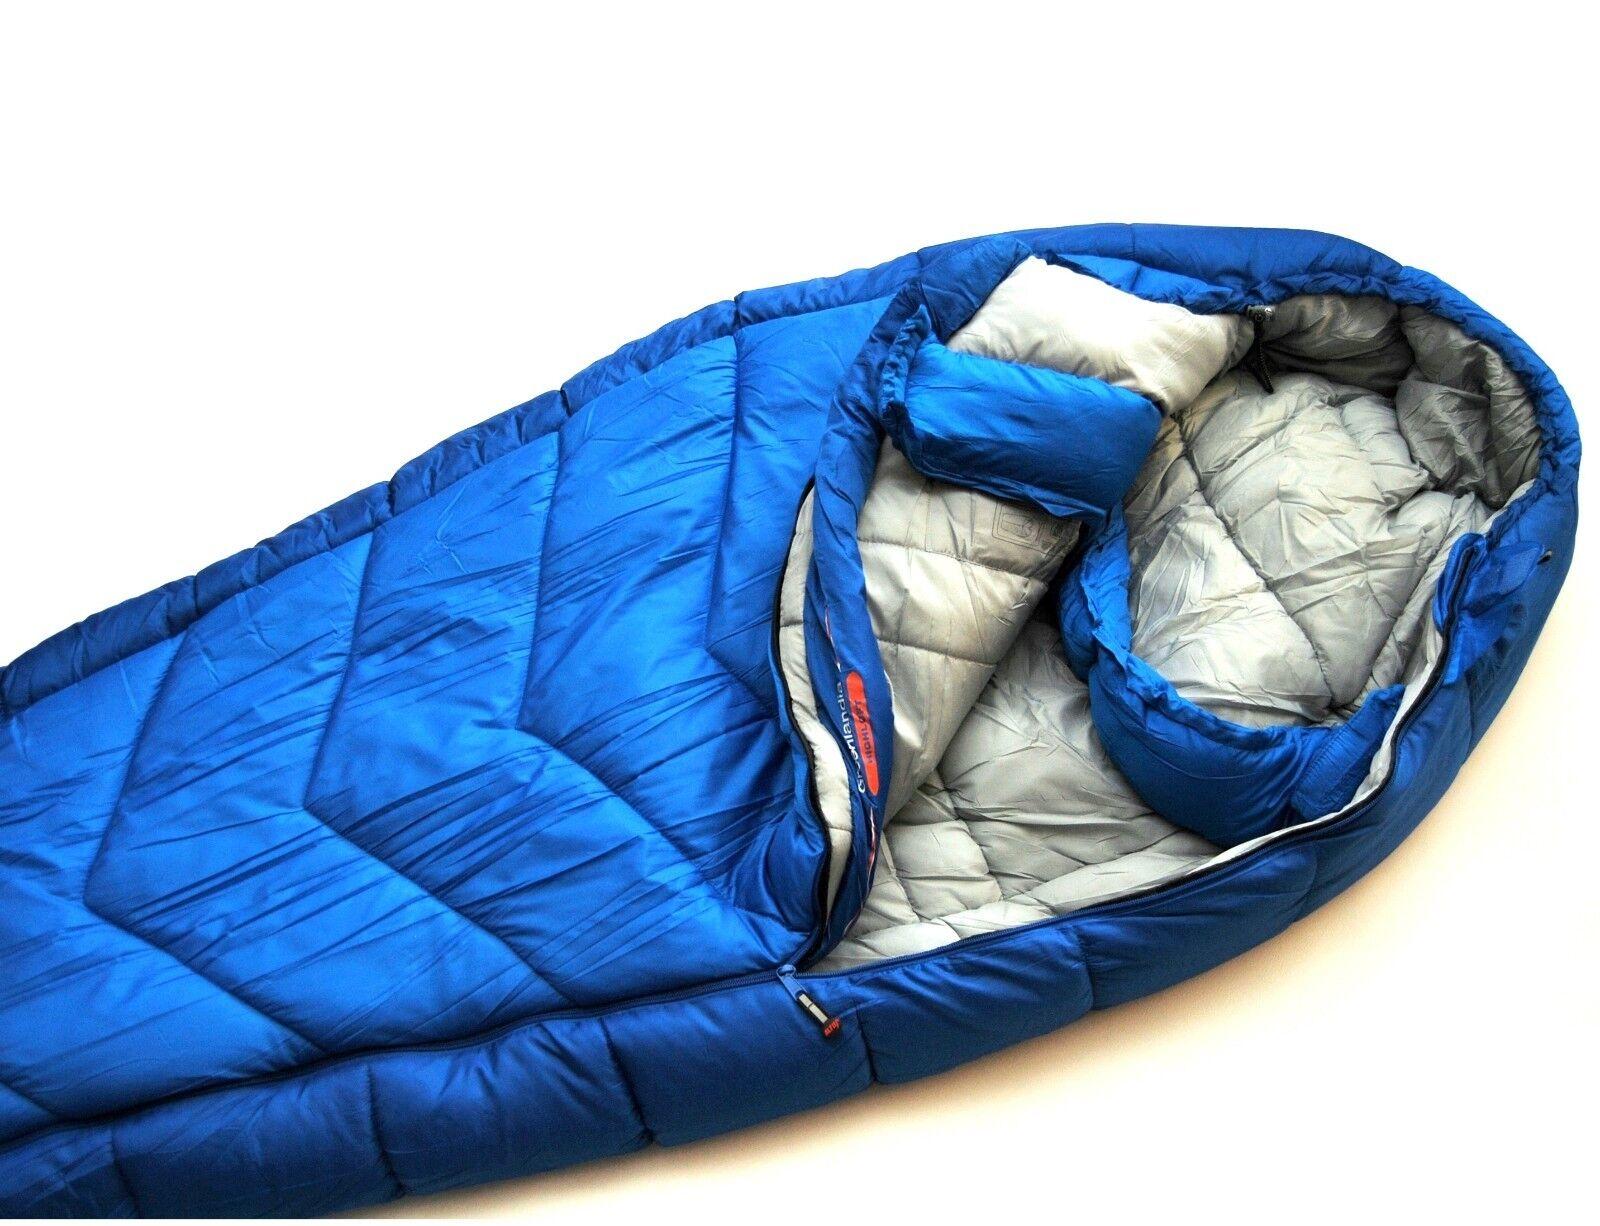 Mummy Sleeping Bag 4 Season GROENLAND Hiking Outdoors extrem - 30 °C